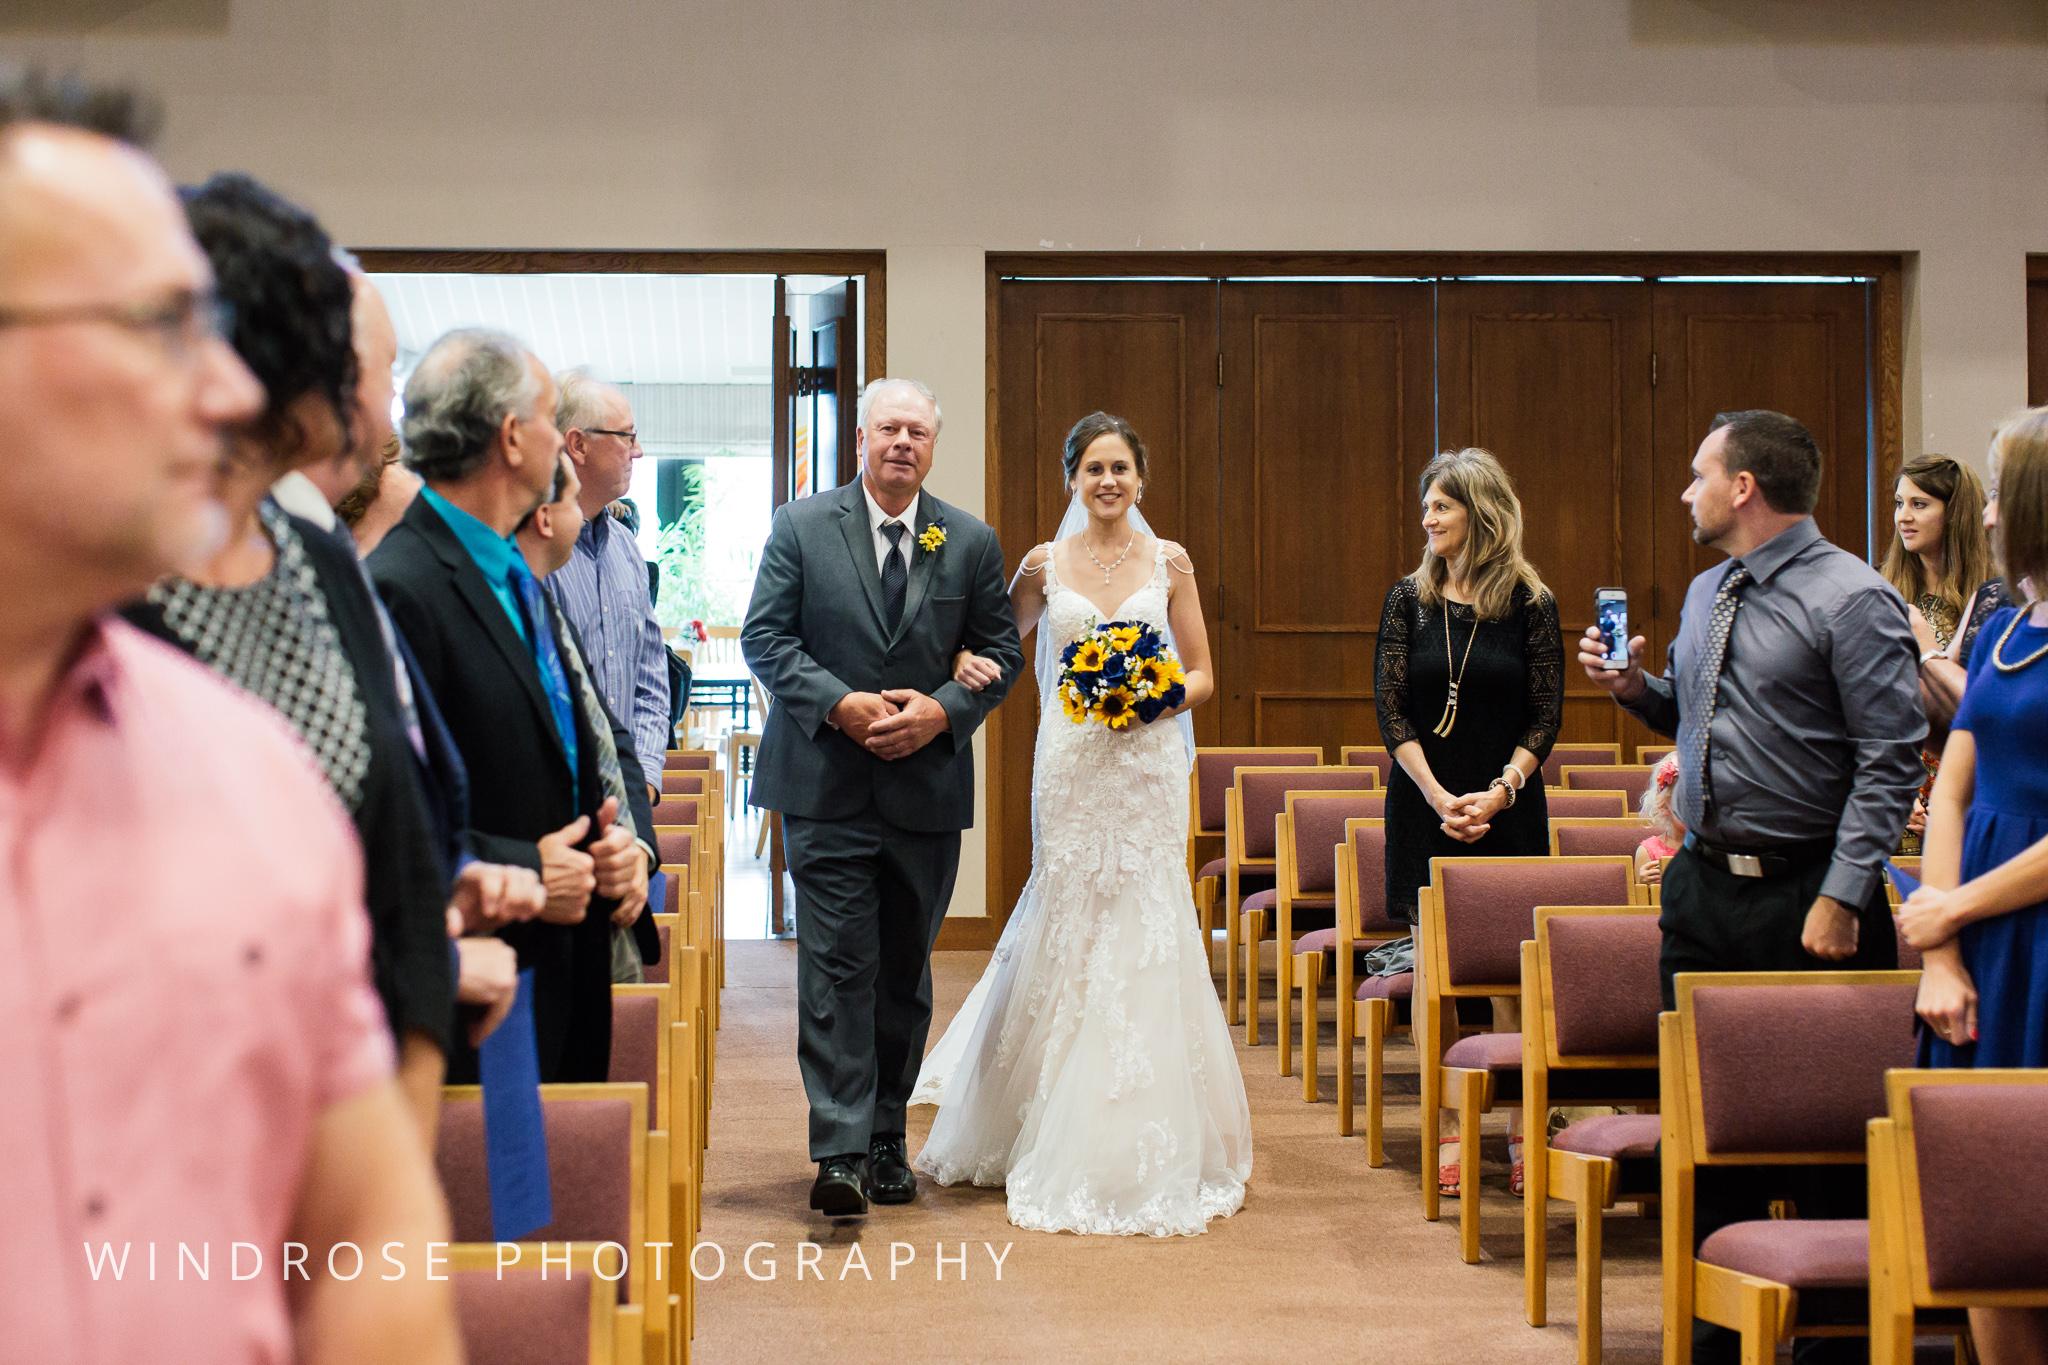 La-Crosse-Country-Club-Wedding-Minnesota-Wedding-Photographer-21.jpg